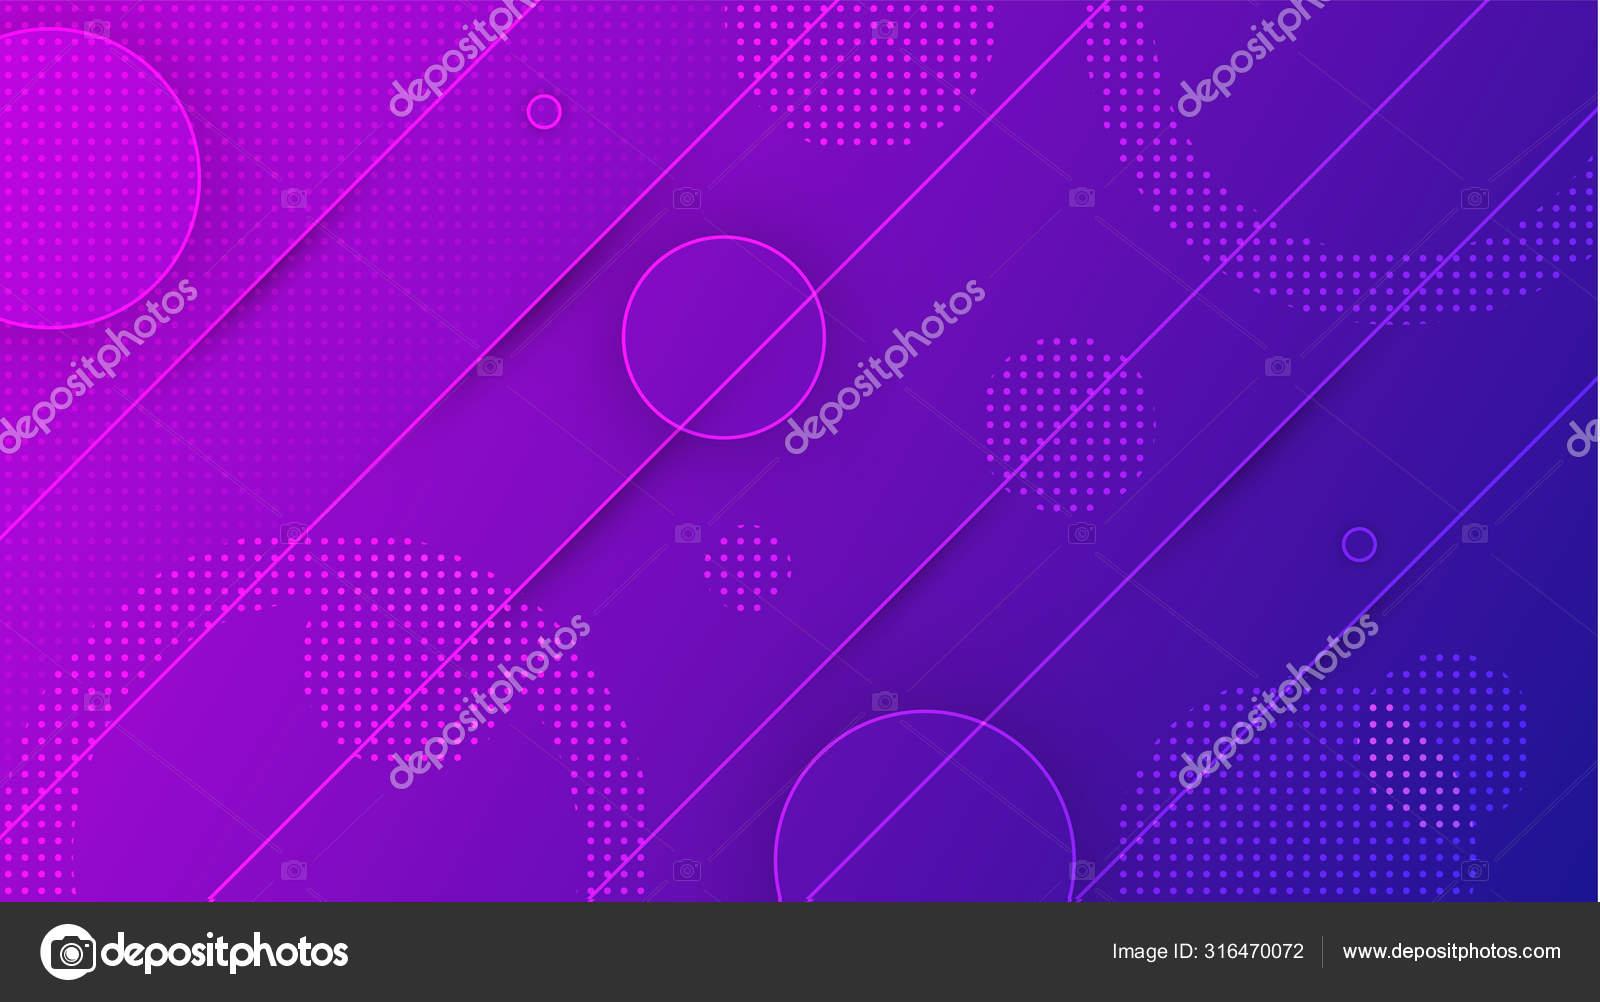 Circles violet gradient background